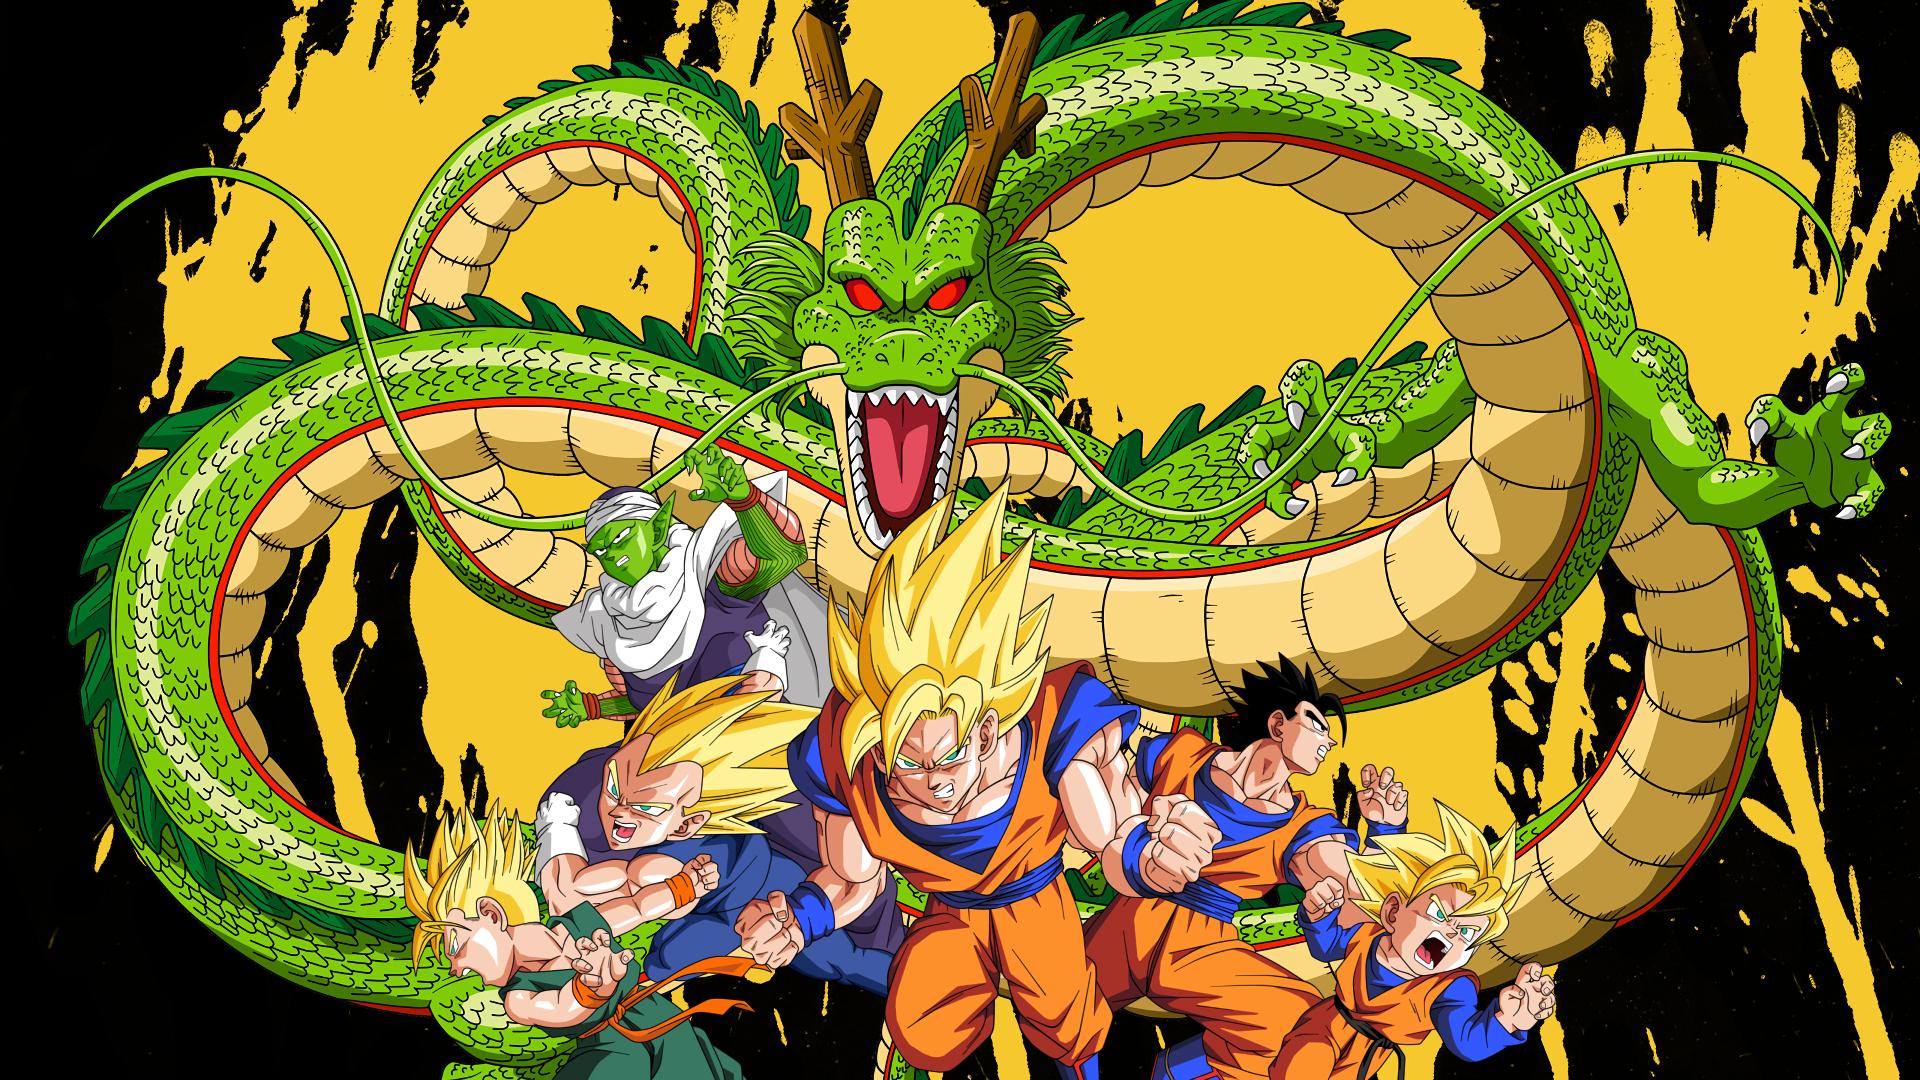 Dragon Ball Z Fond d'écran HD   Arrière-Plan   1920x1080   ID:739914 - Wallpaper Abyss